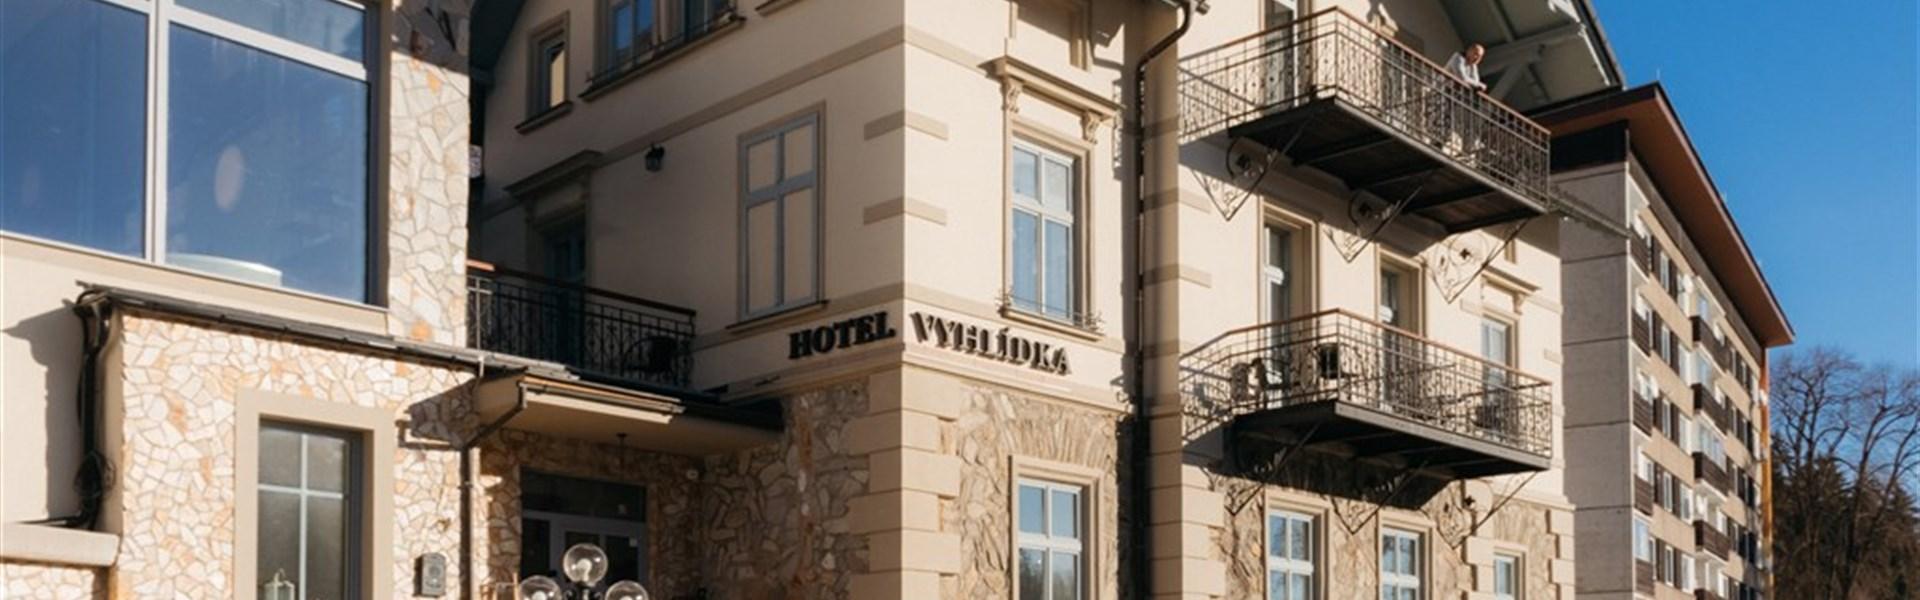 Marco Polo - Hotel Vyhlídka -